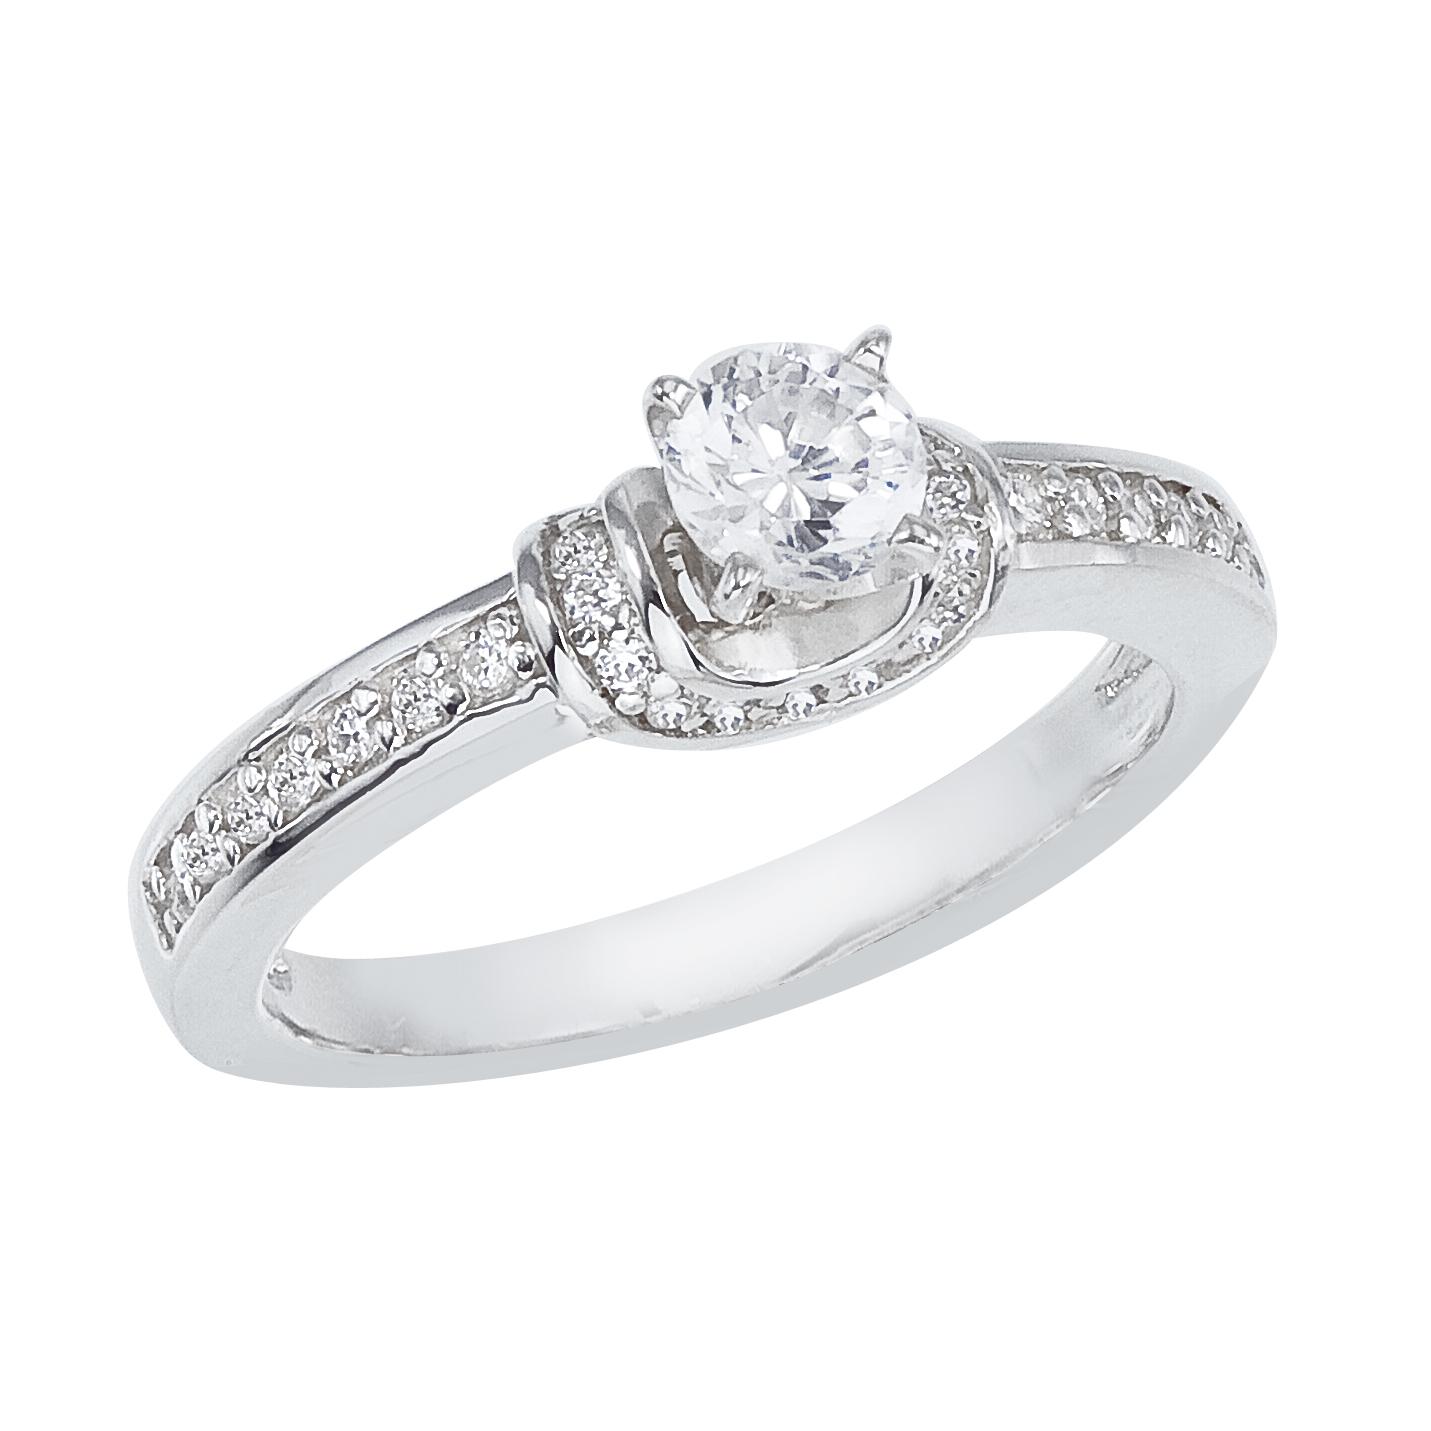 14k White gold Classic Diamond QPID Engagement Ring (0.44 tcw)